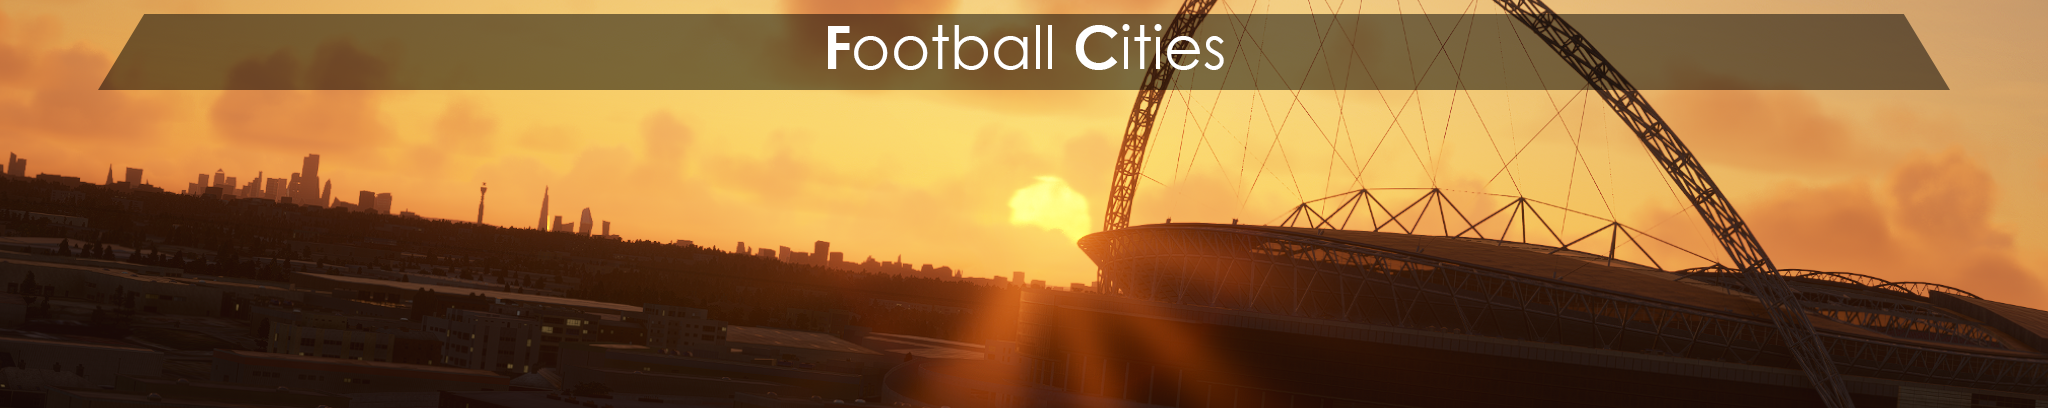 Football Cities - Europe